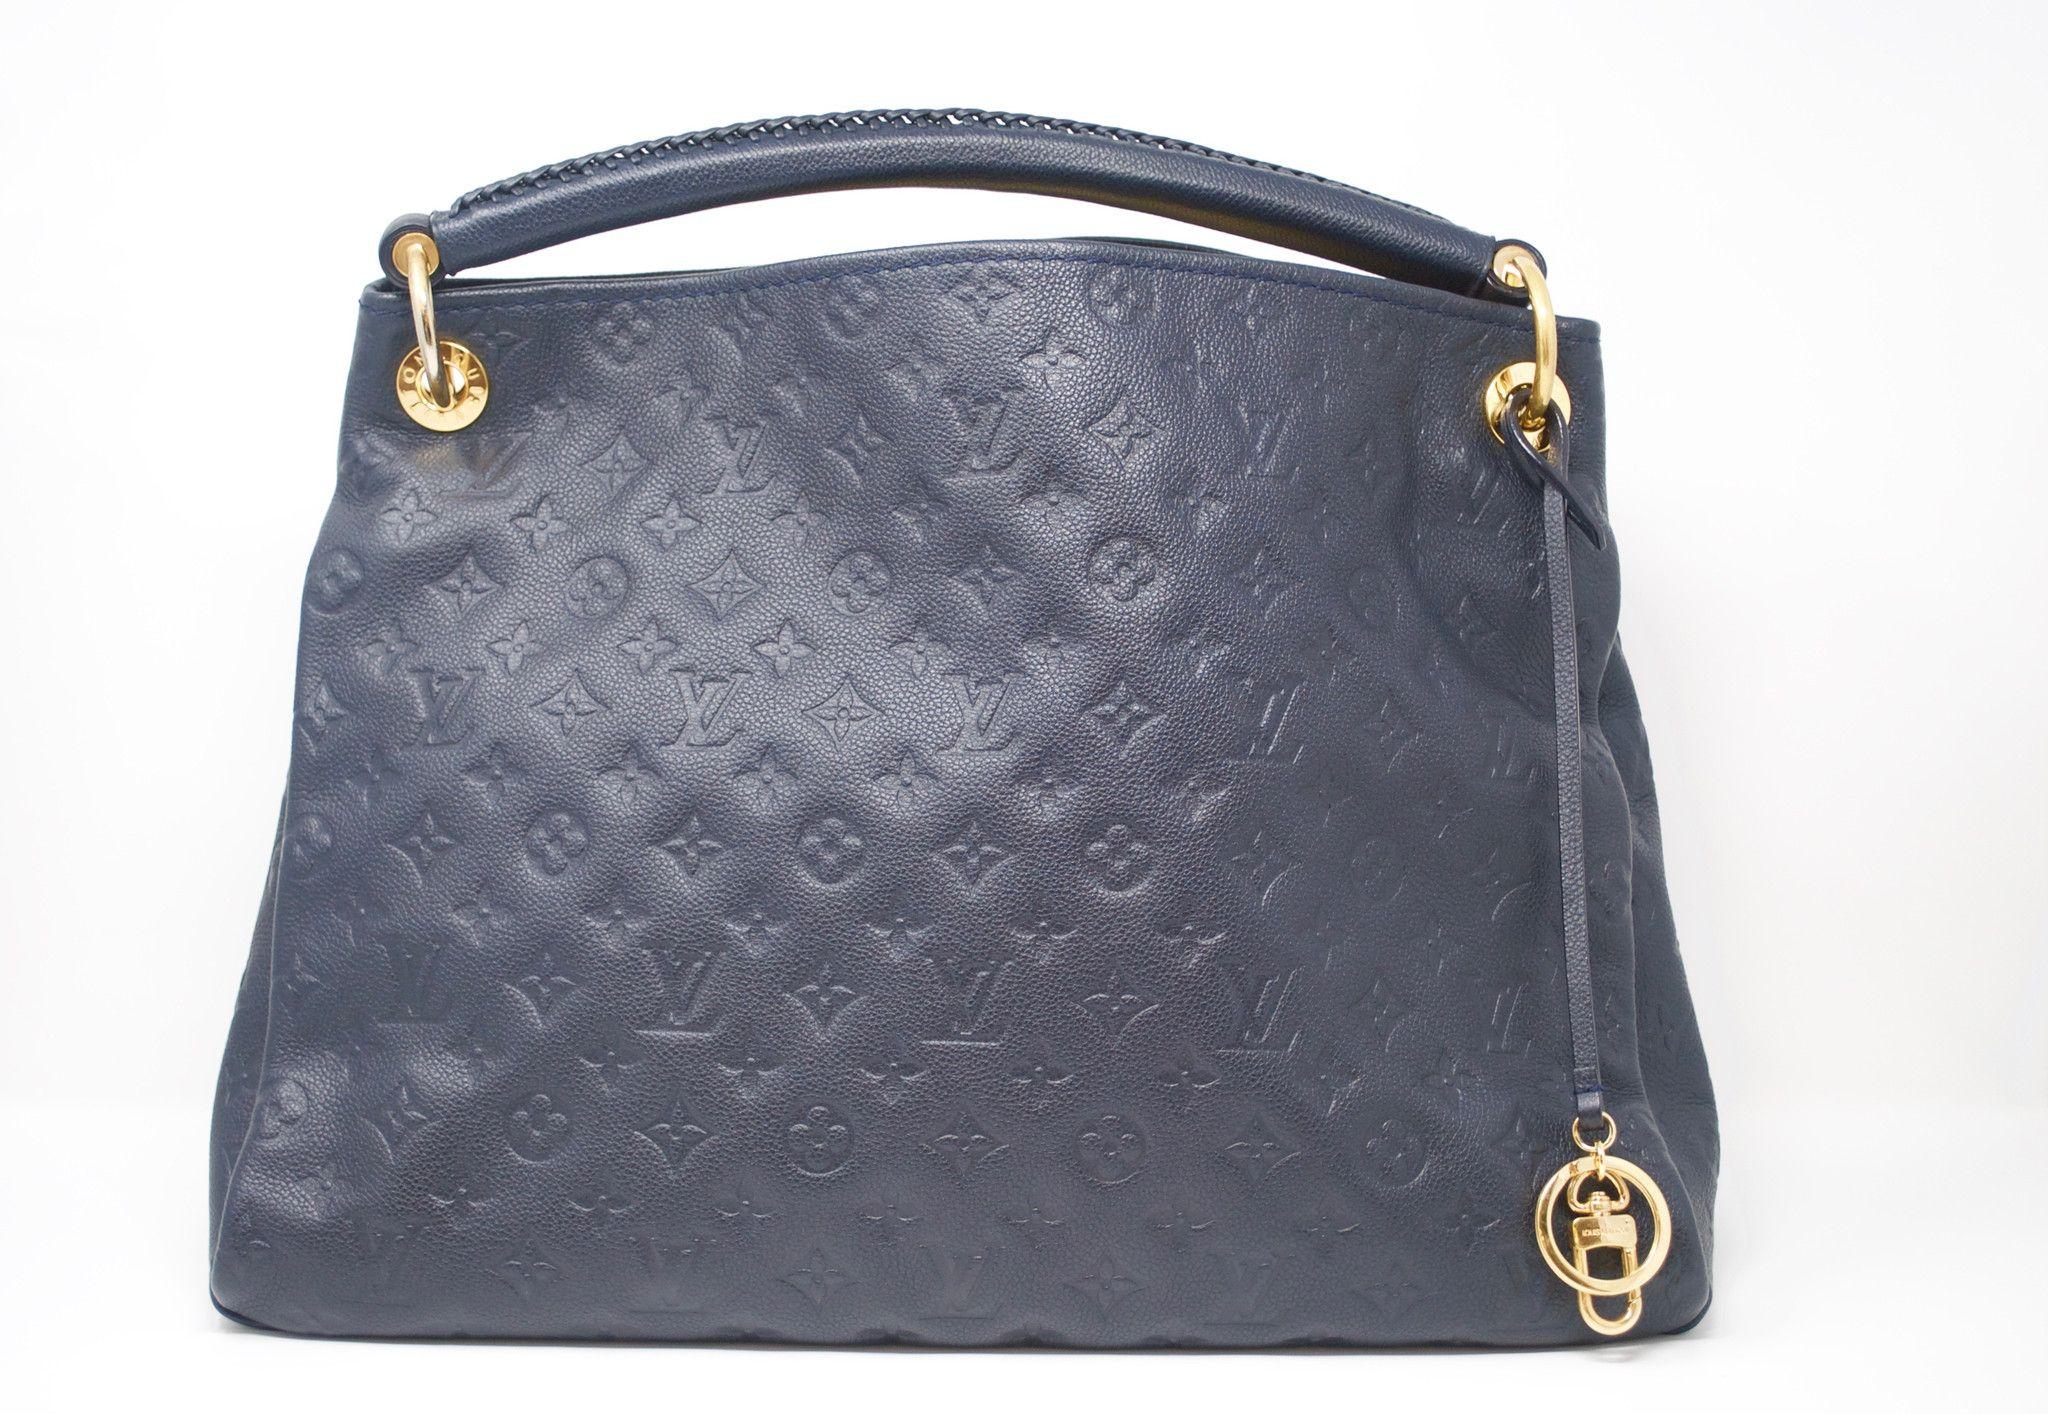 Louis Vuitton Empreinte Artsy MM in Bleu Infini - SKU 950